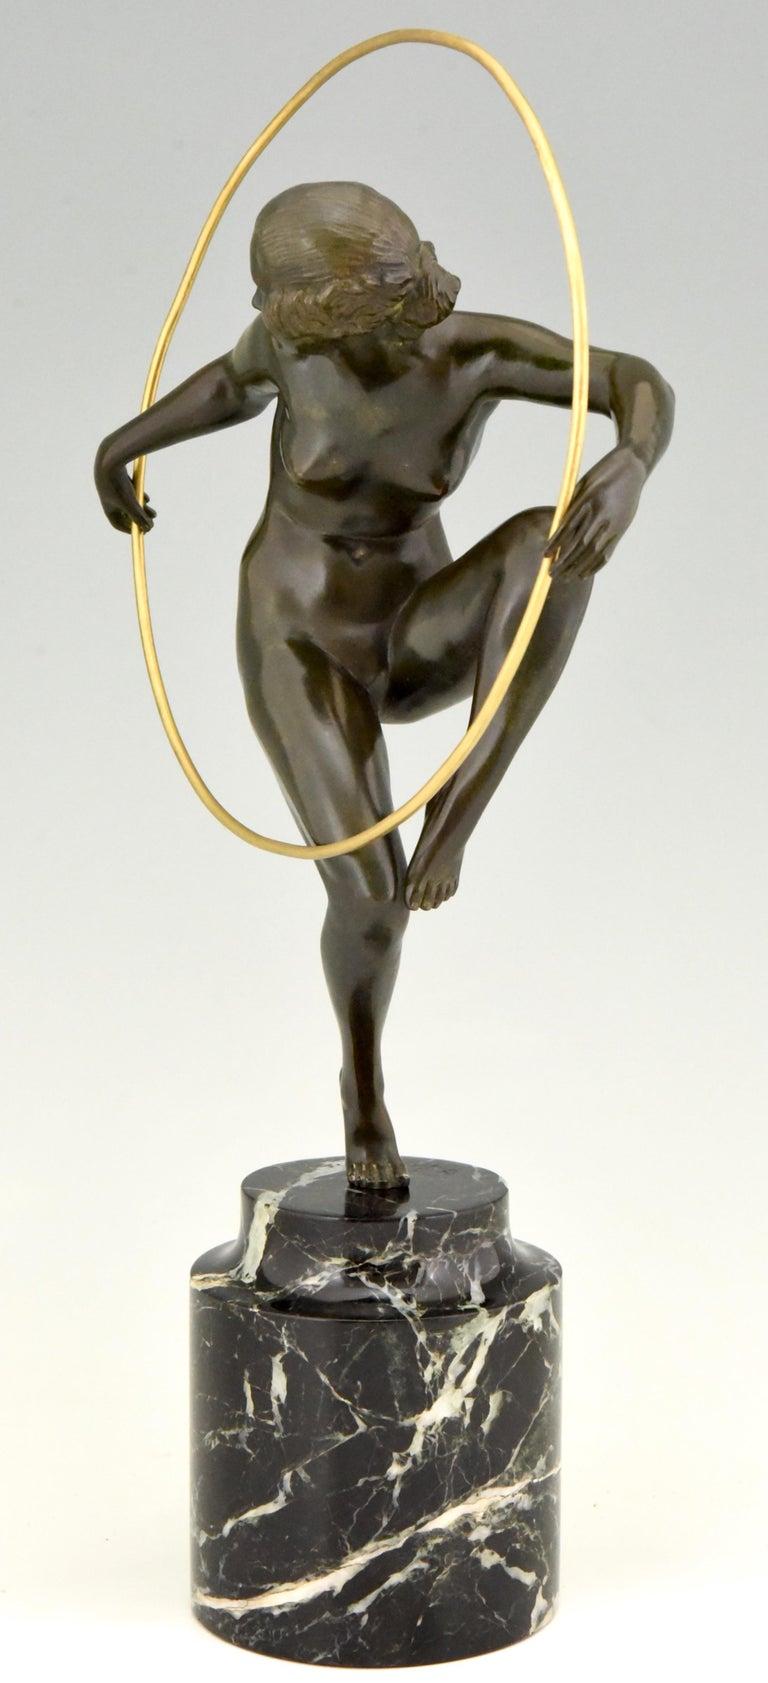 Art Deco Bronze Nude Hoop Dancer Andre Marcel Bouraine, 1930, France For Sale 1